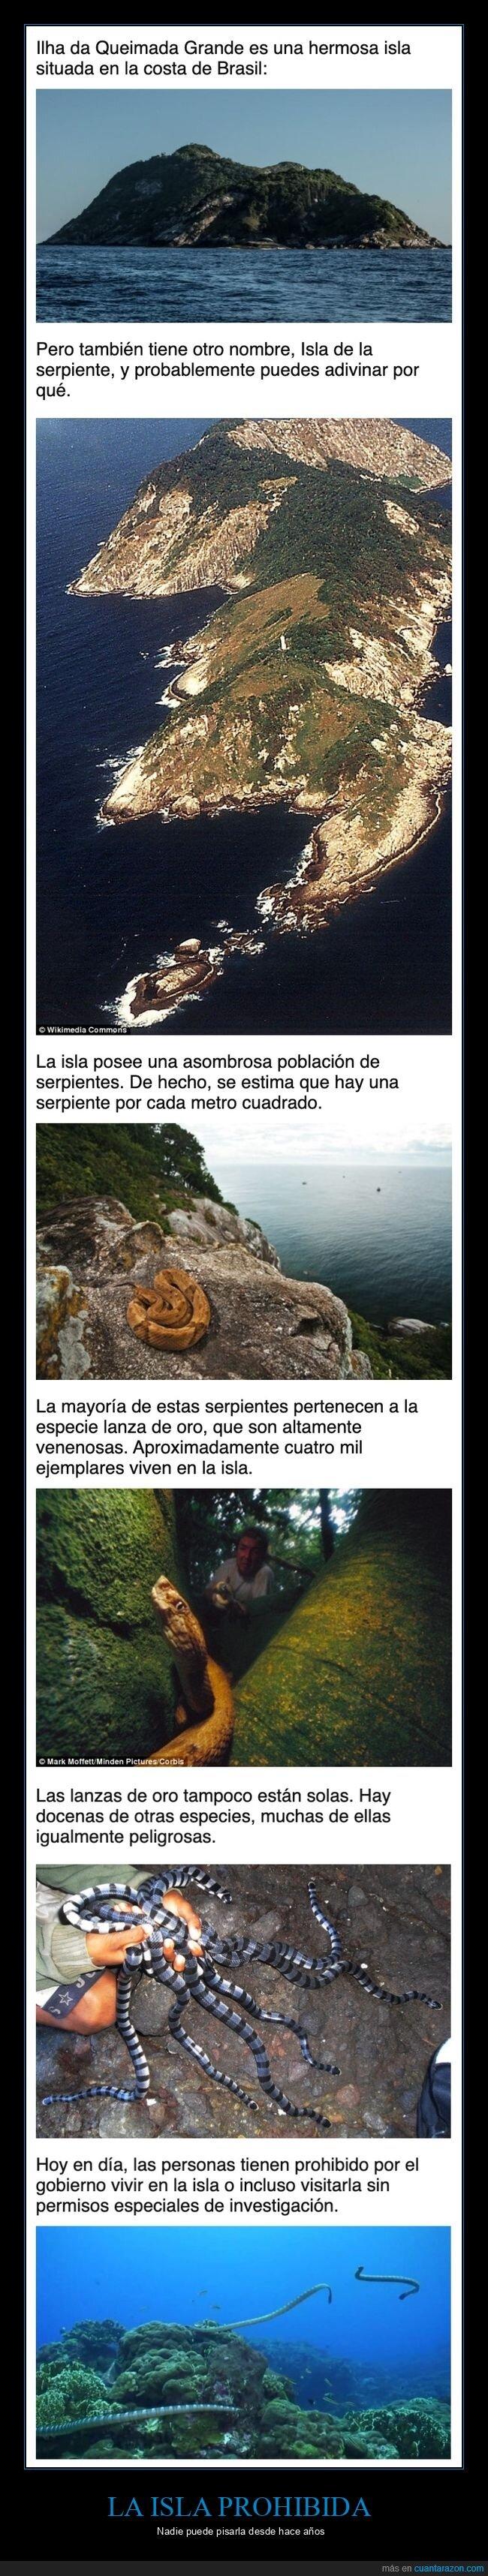 isla,prohibida,serpientes